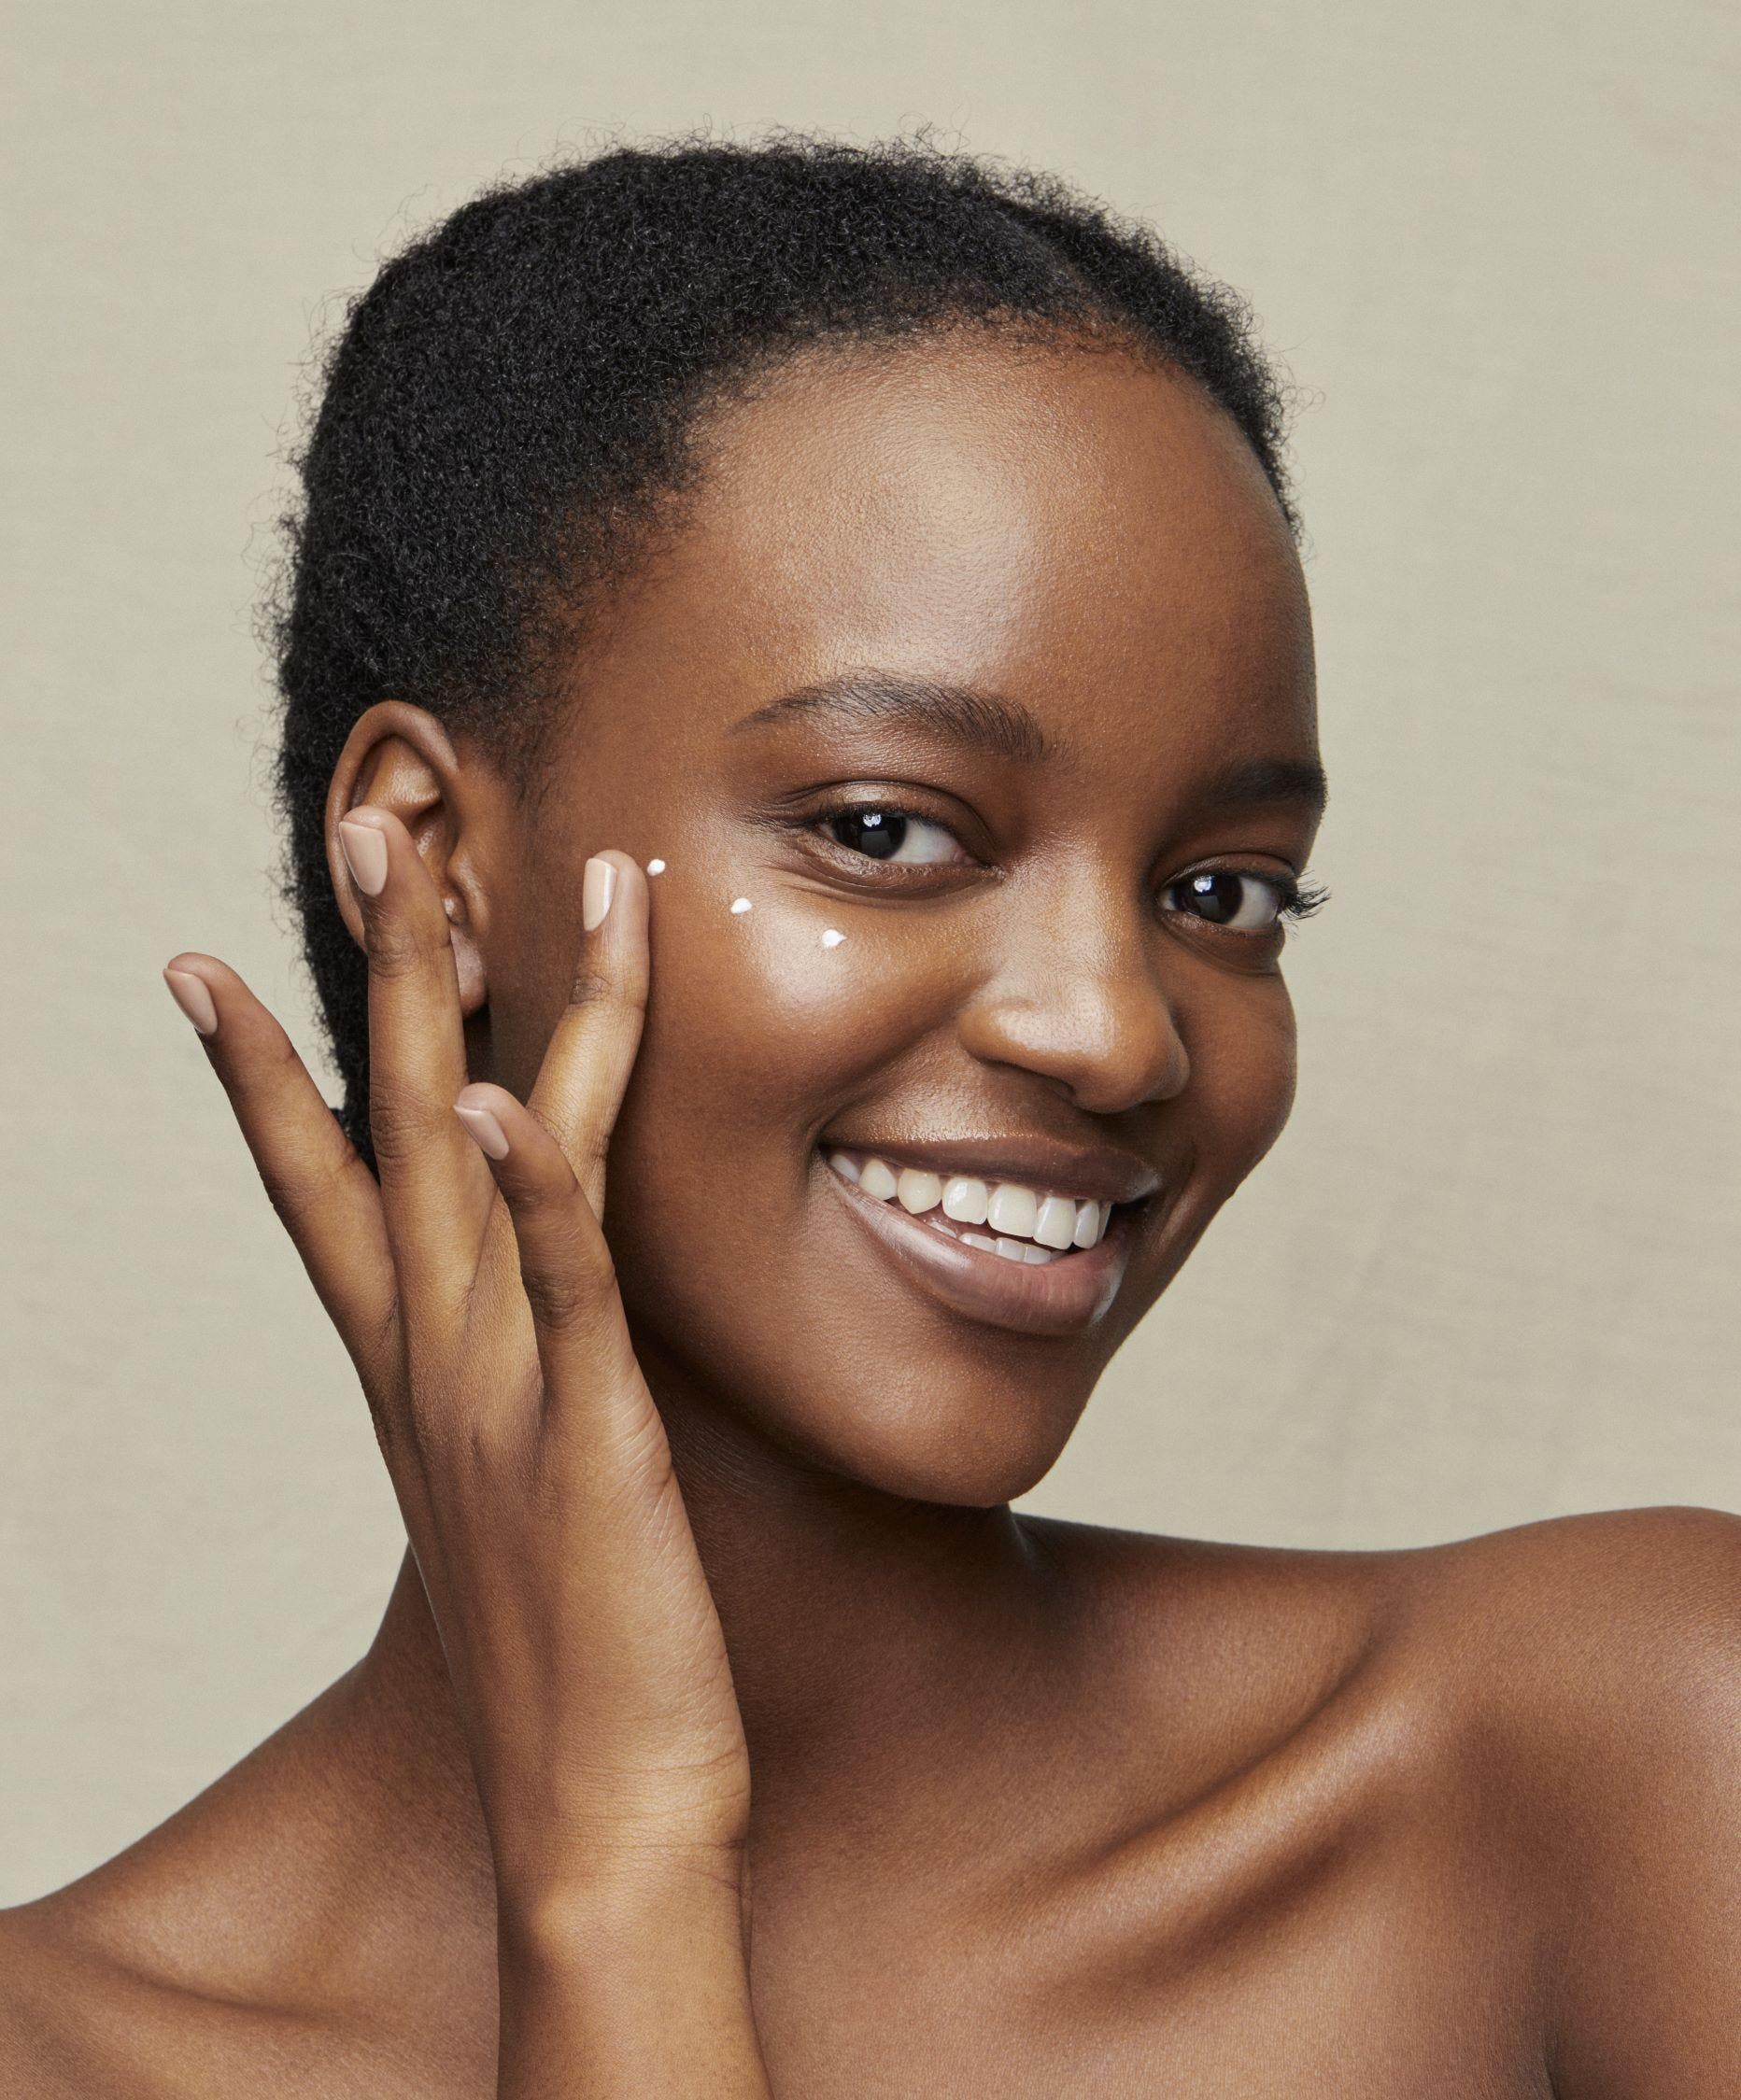 endota eye cream - where to apply